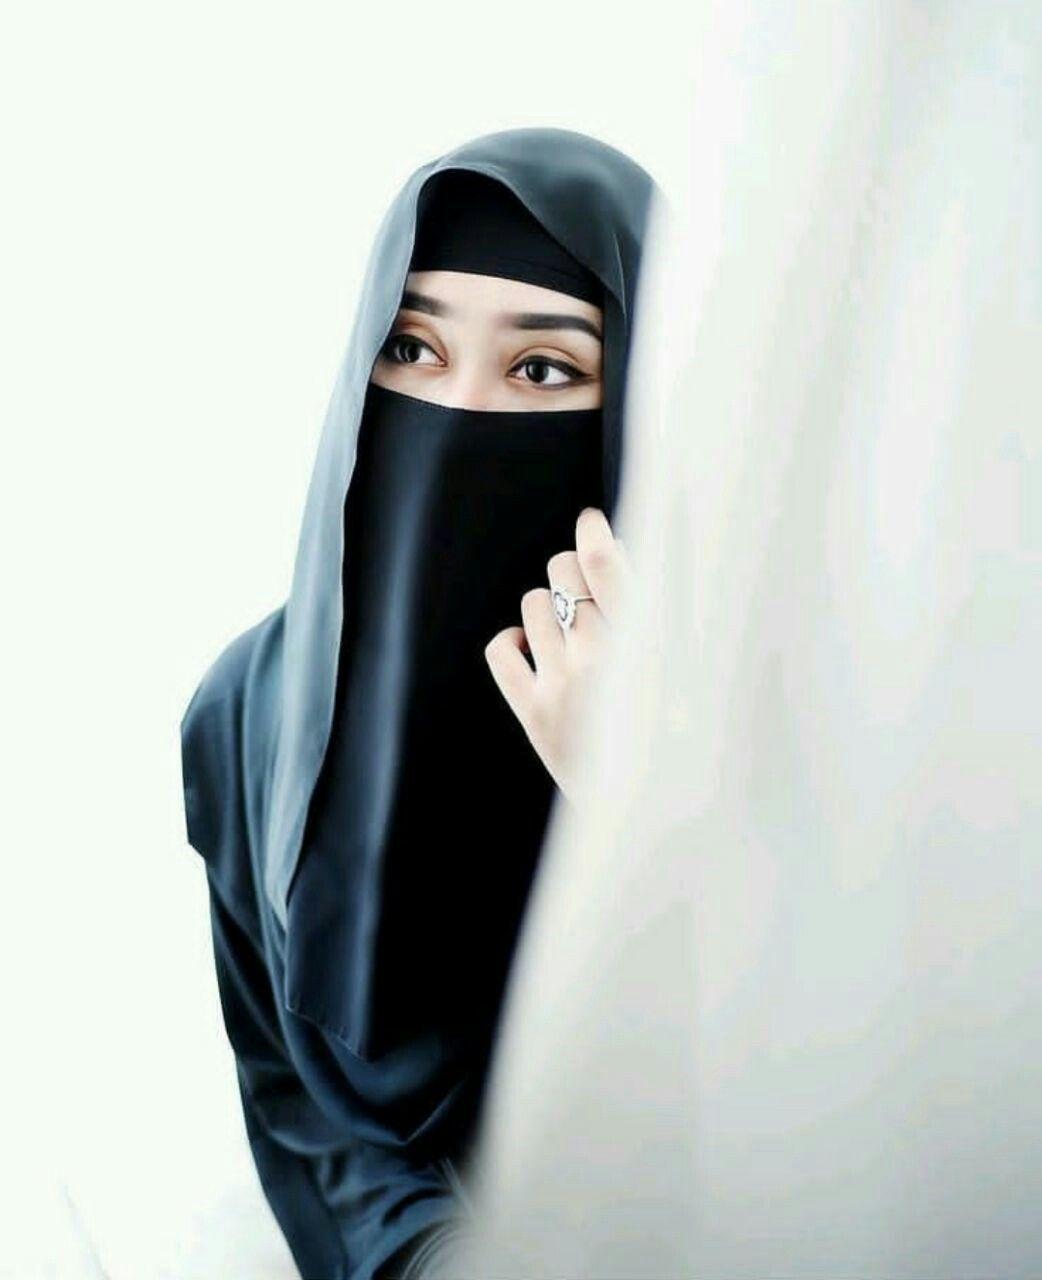 Pin By Zarar Khan On Girls Dpzz Beautiful Hijab Muslim Women Hijab Muslim Girls